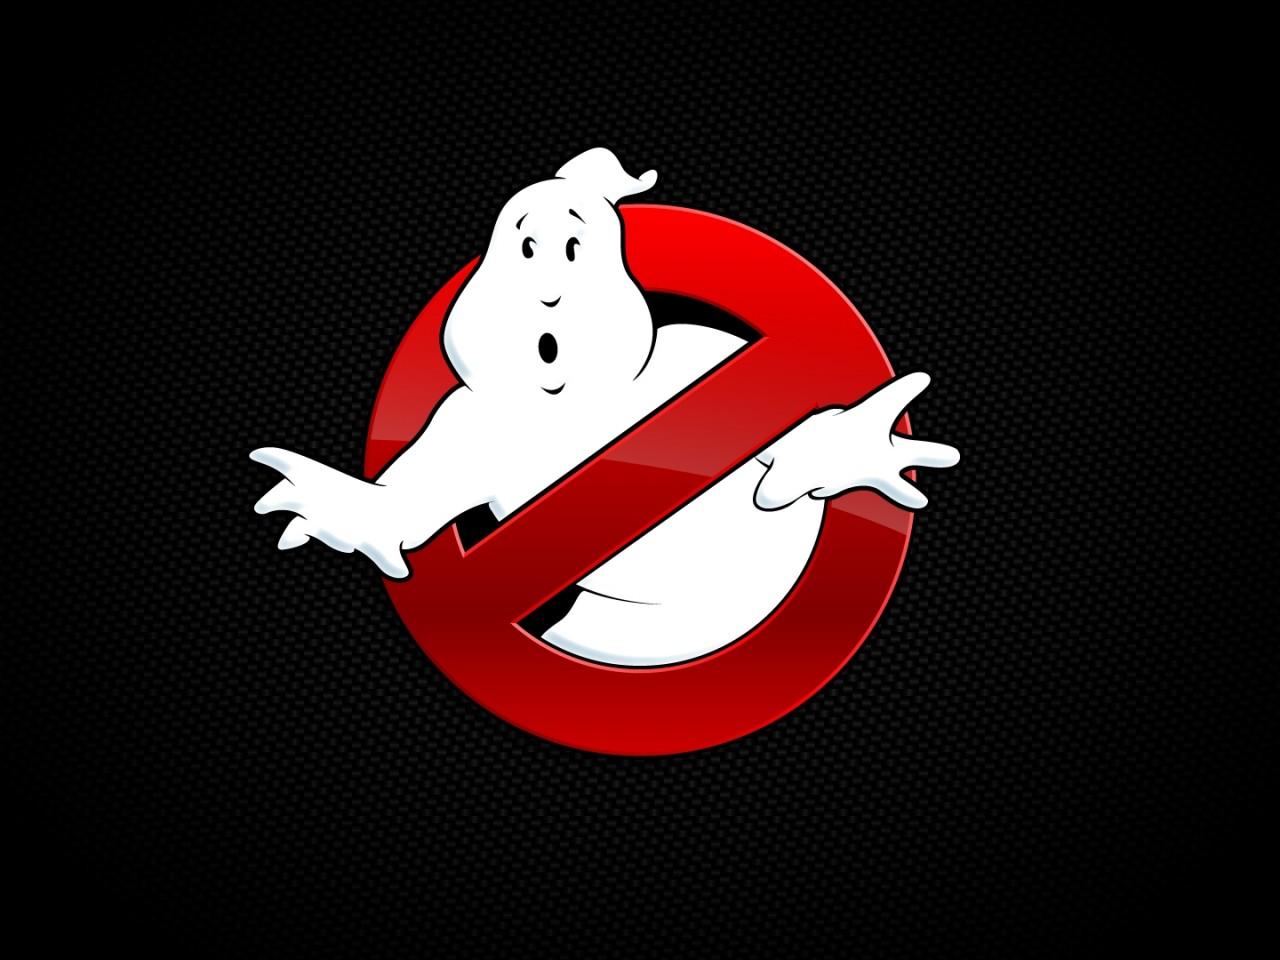 ghostbusters wallpaper